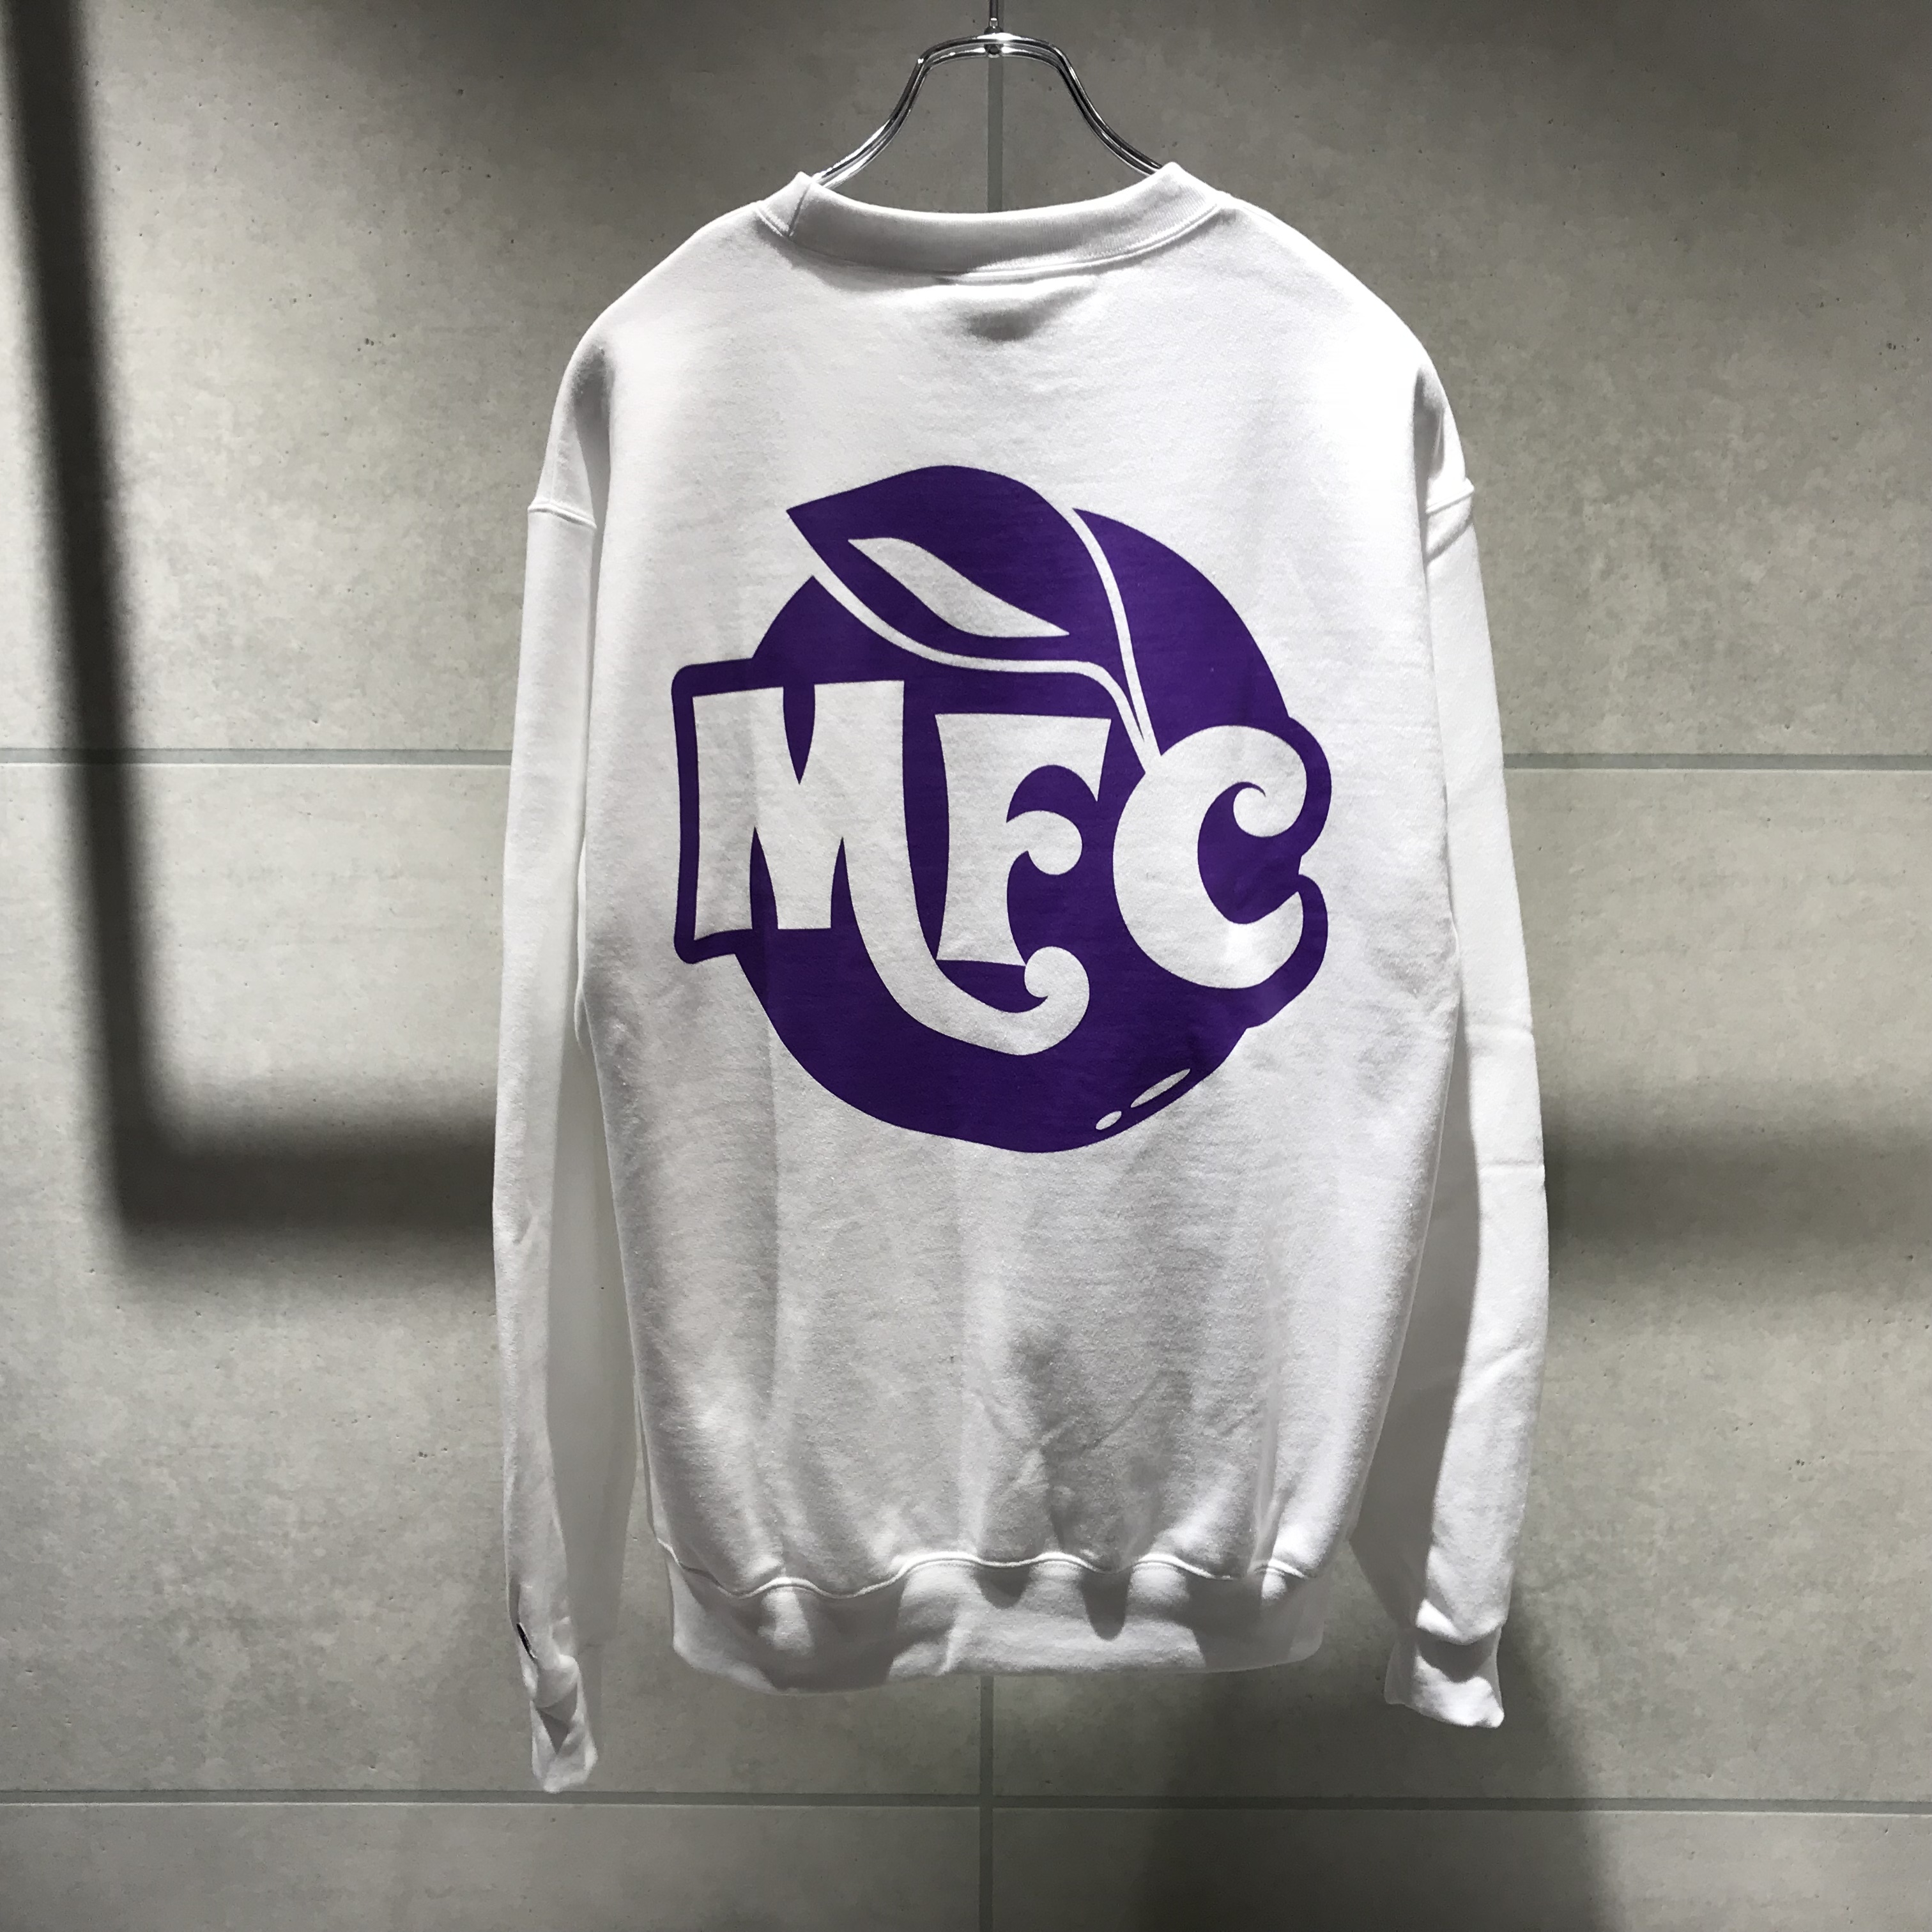 MFC STORE TYPE 8 CREWNECK SWEATSHIRT / WHITE x PURPLE